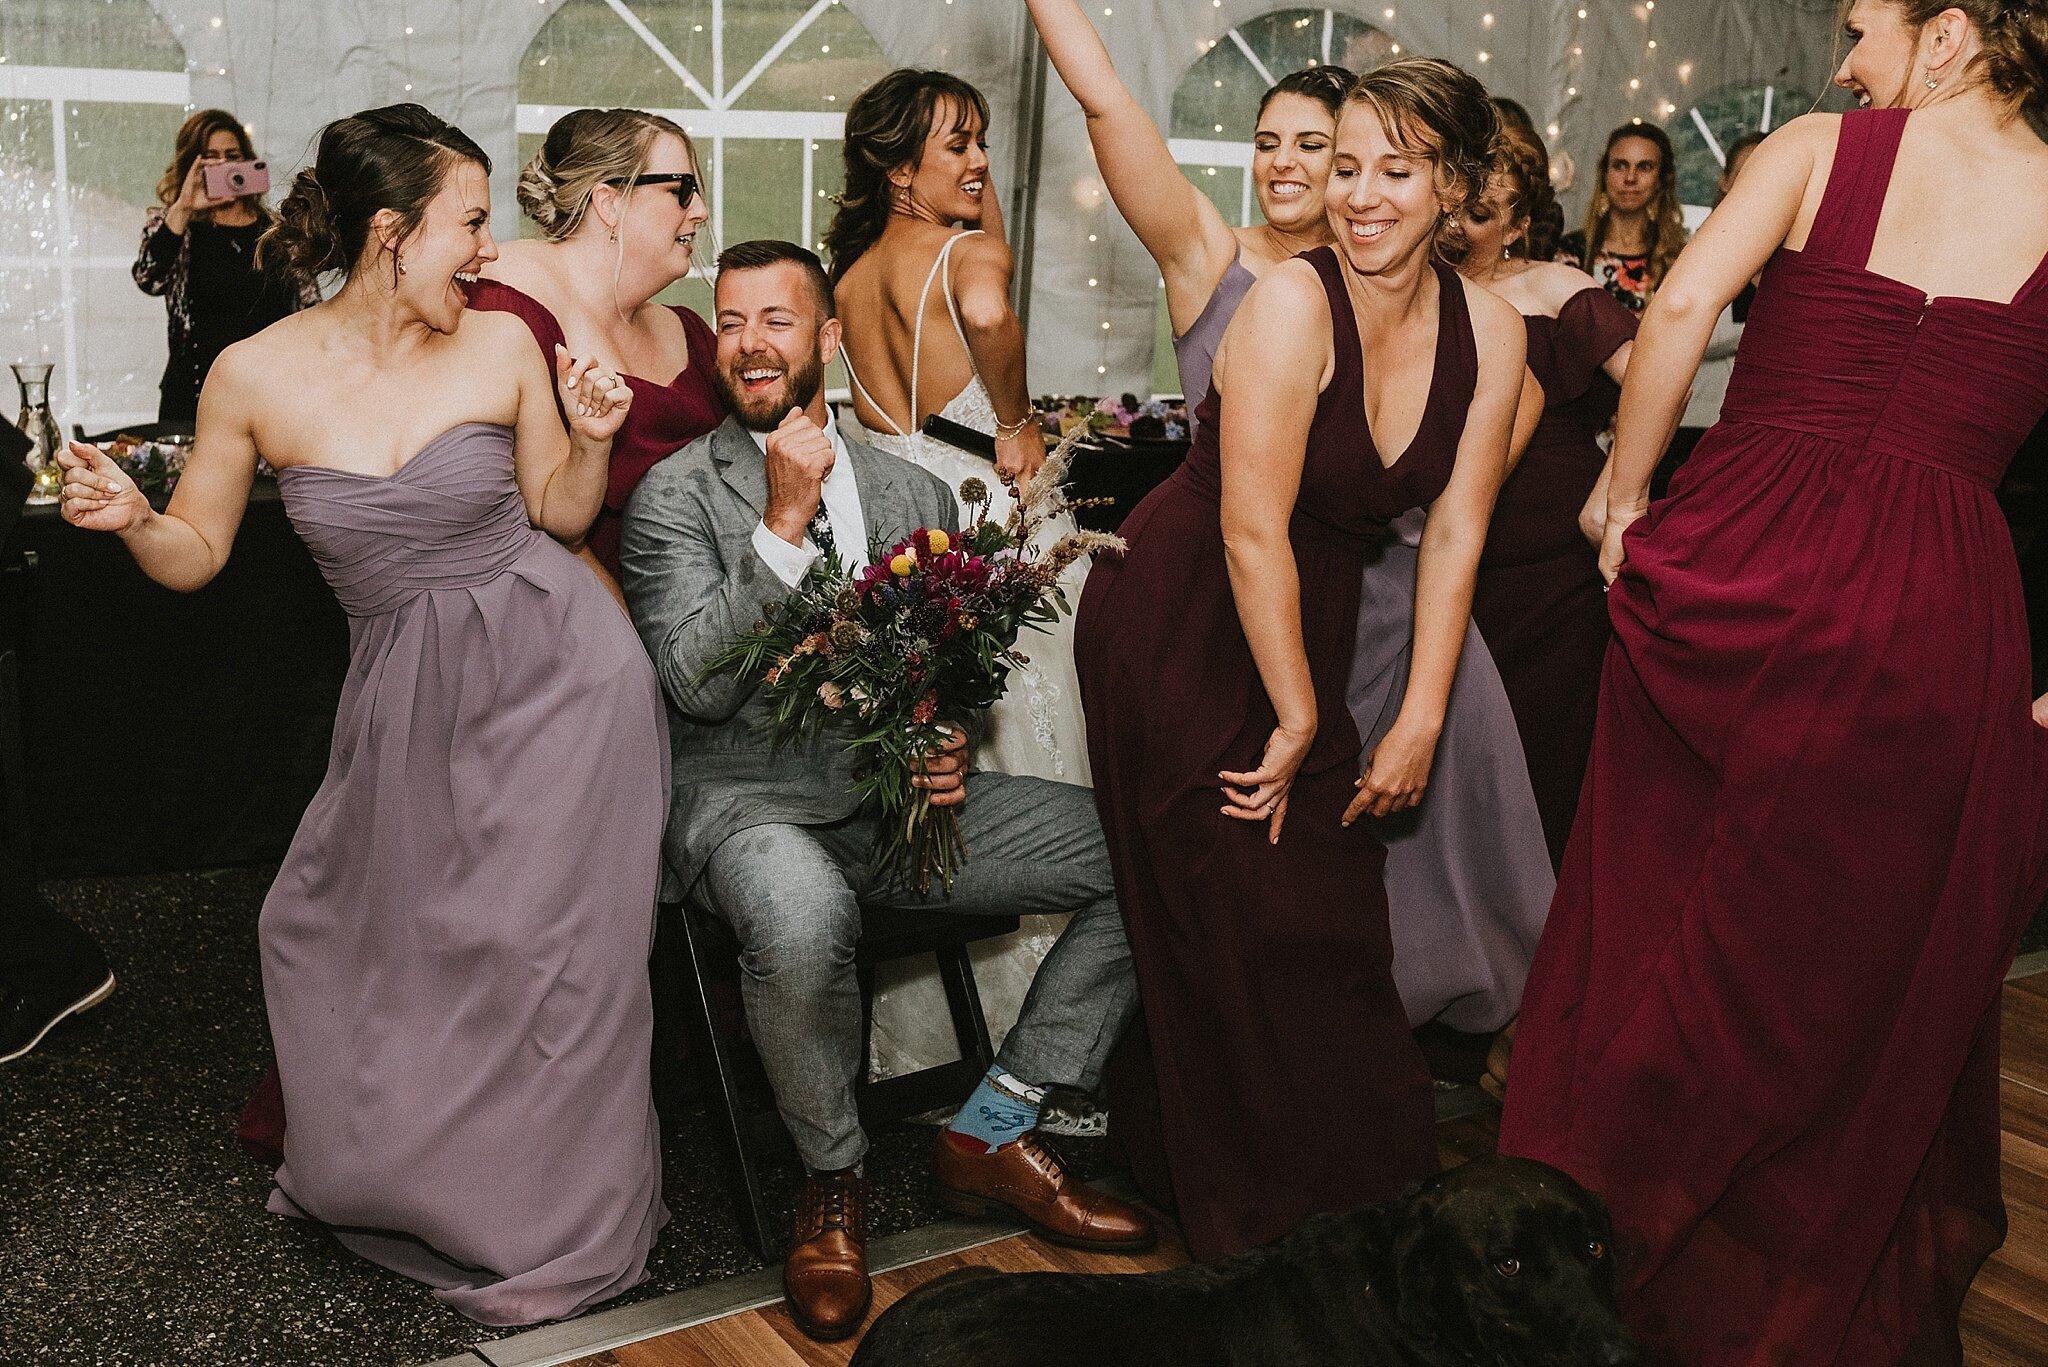 connecticut_wedding_3097.jpg